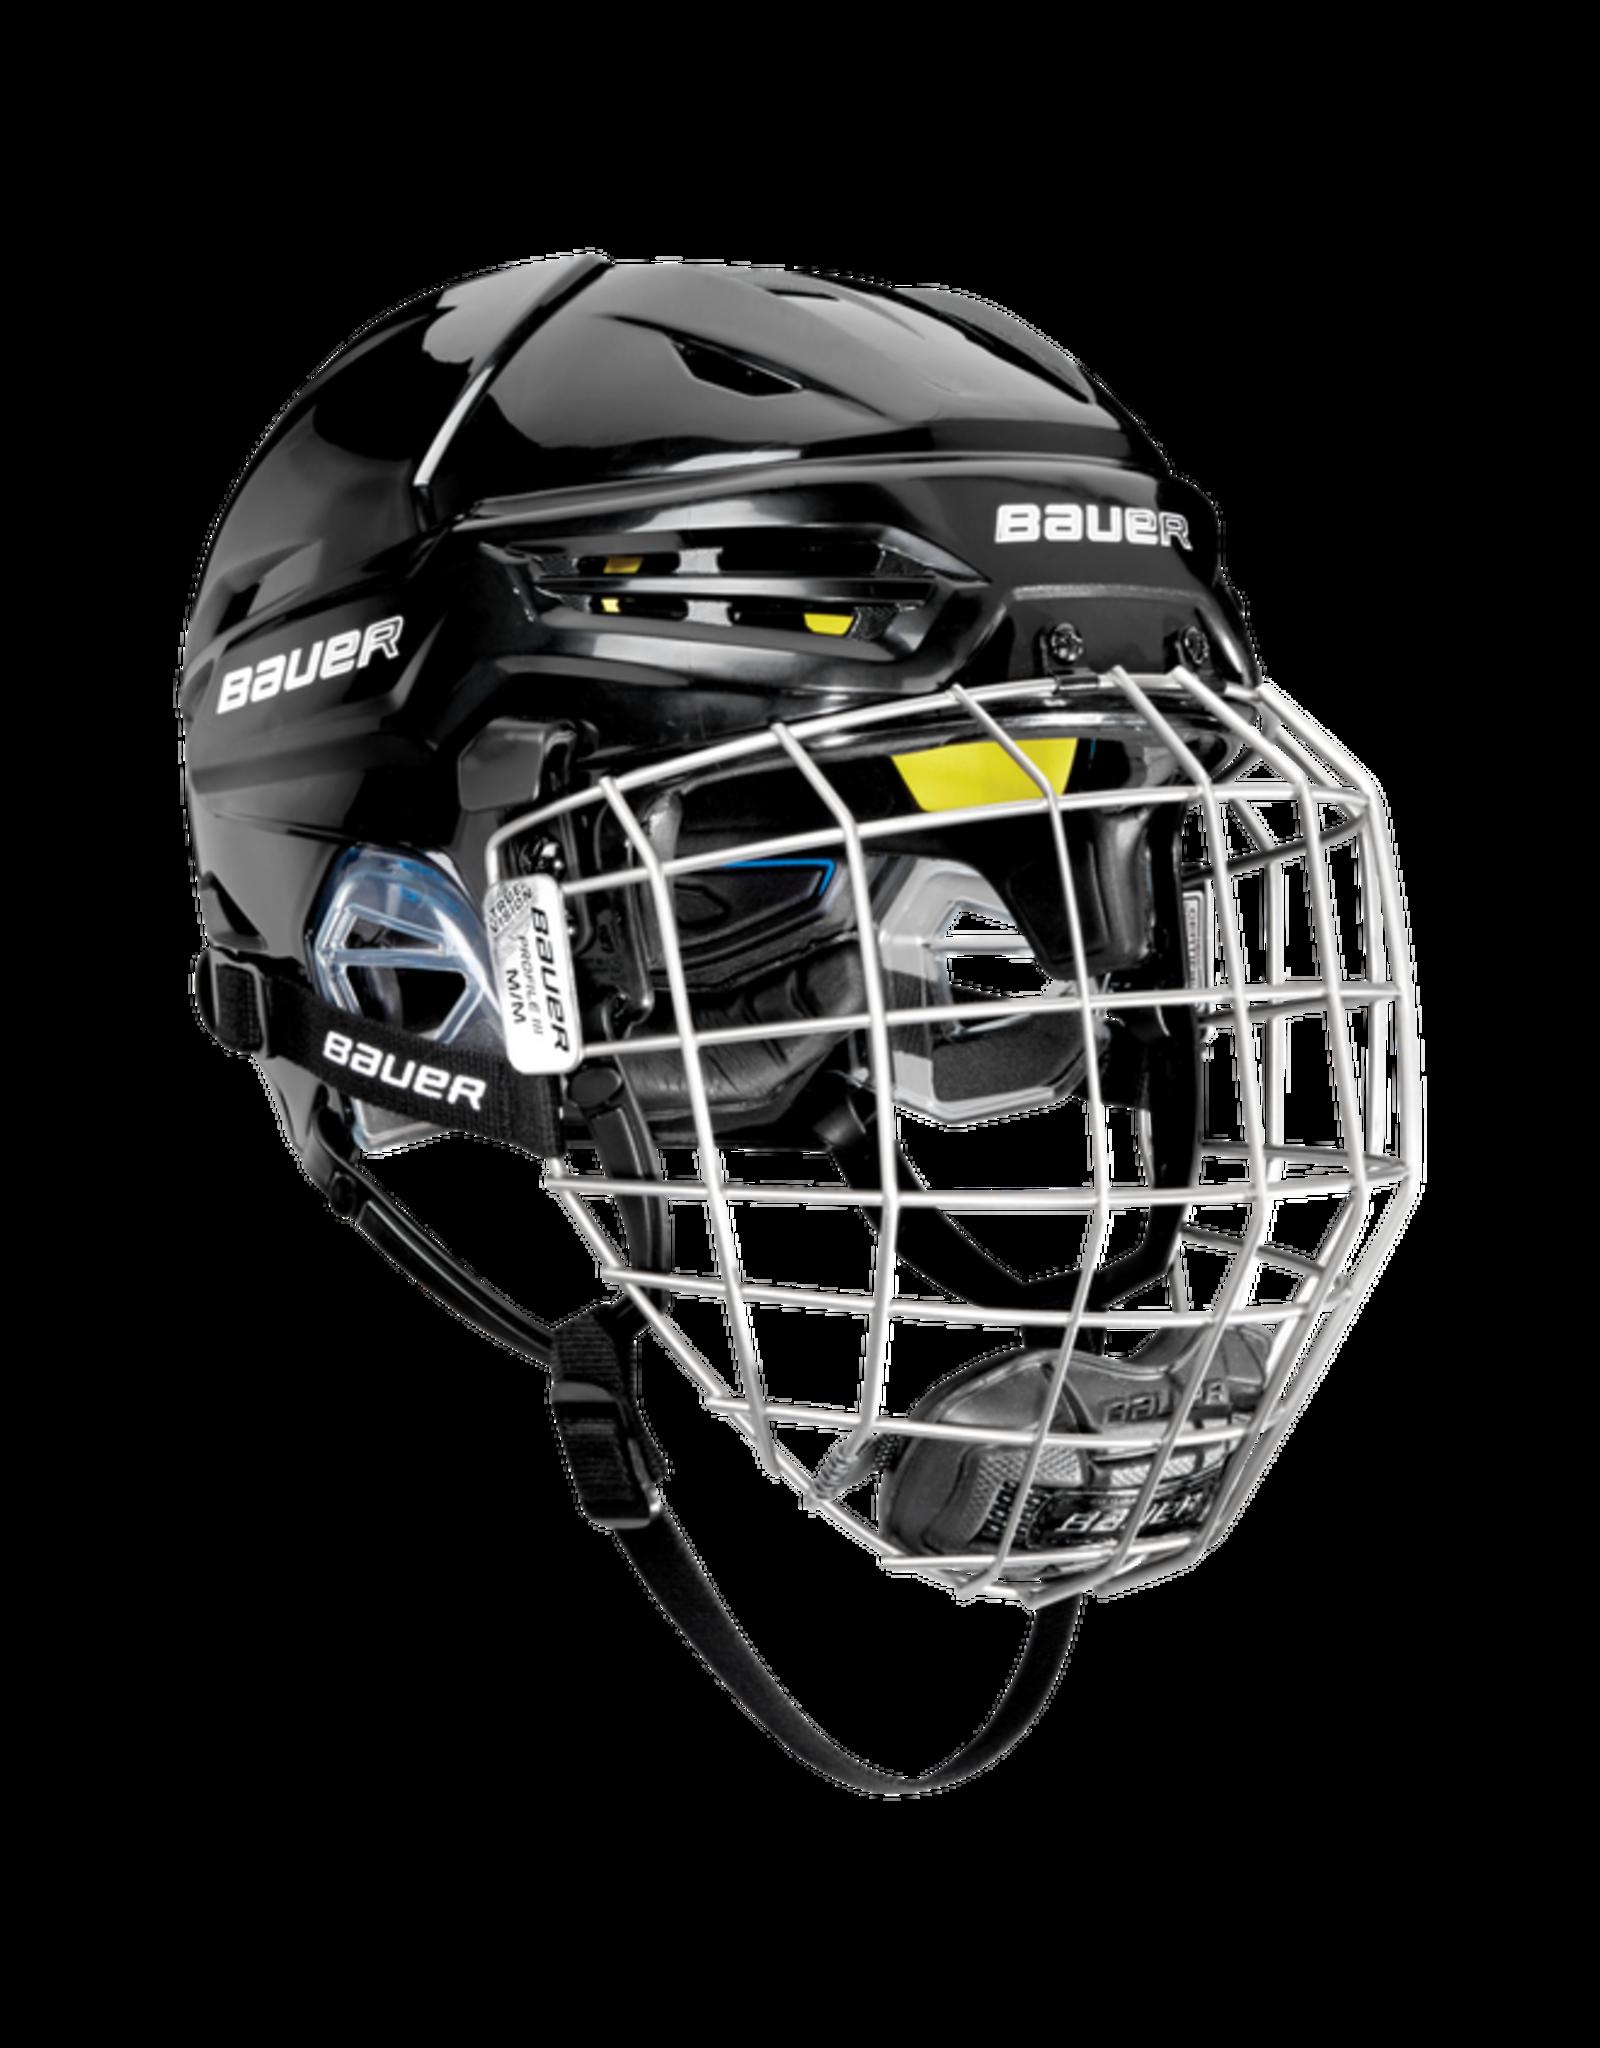 Bauer Hockey - Canada BAUER RE-AKT 95 HELMET COMBO